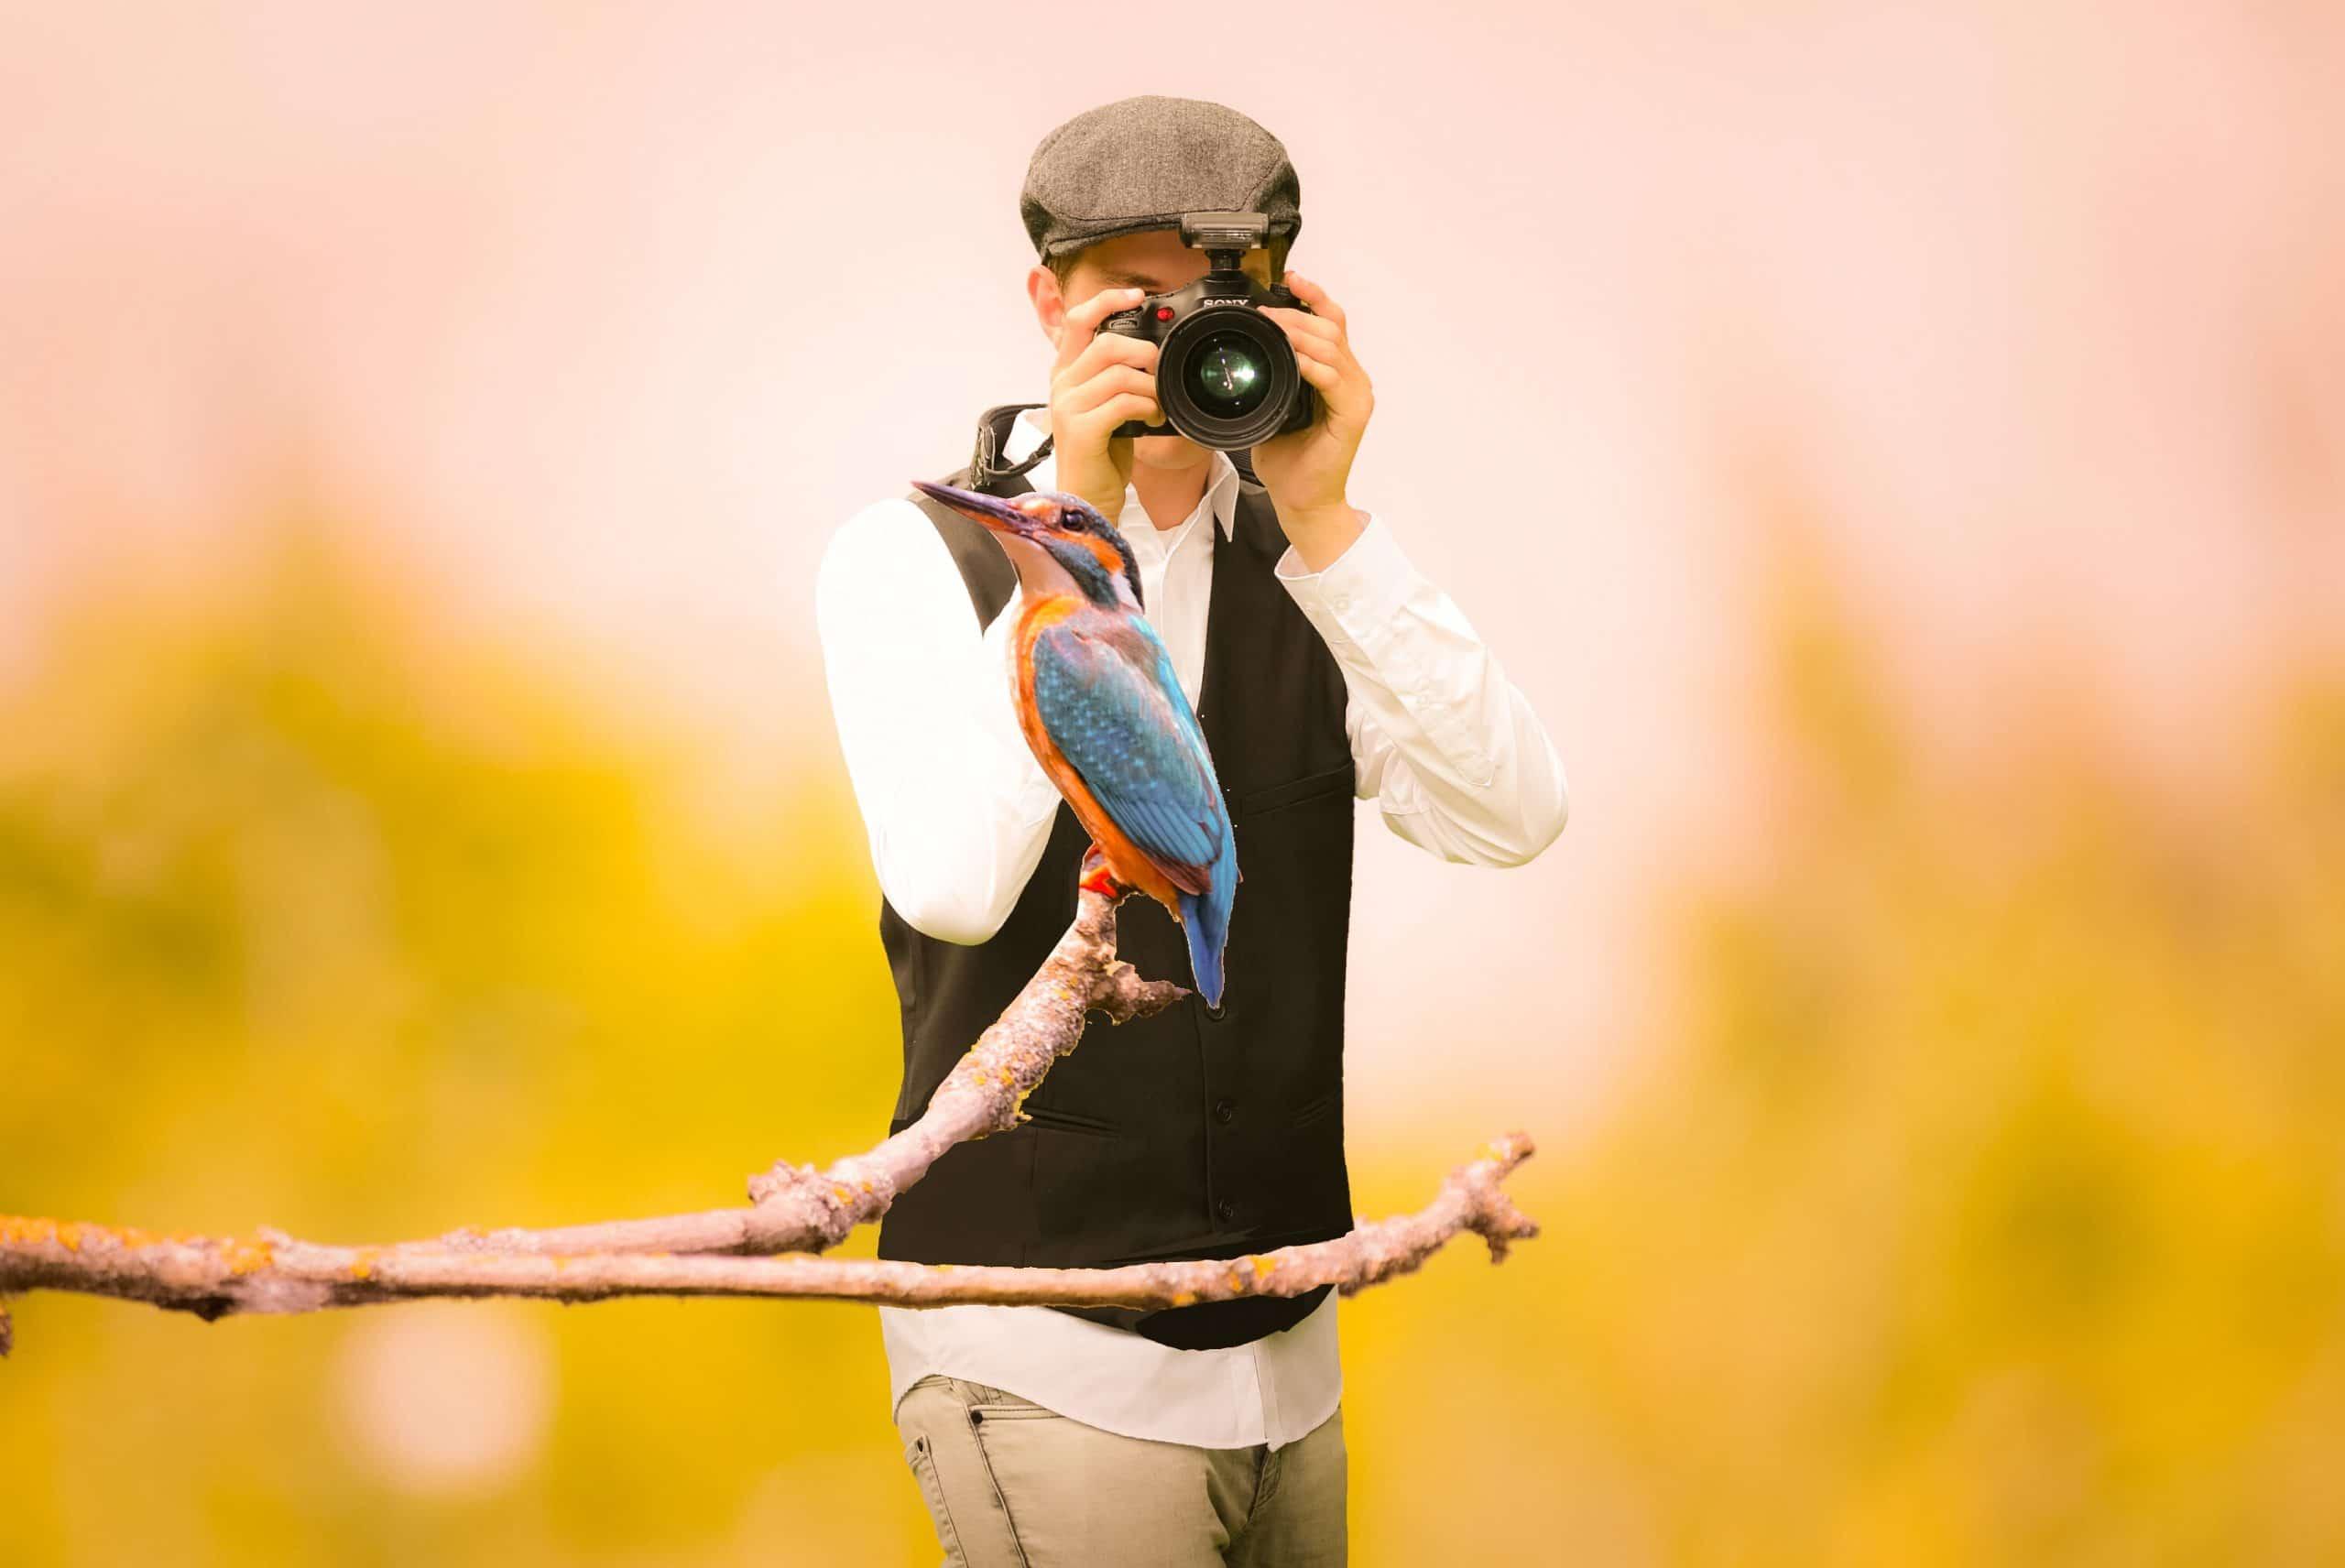 Man taking a photo of a bird